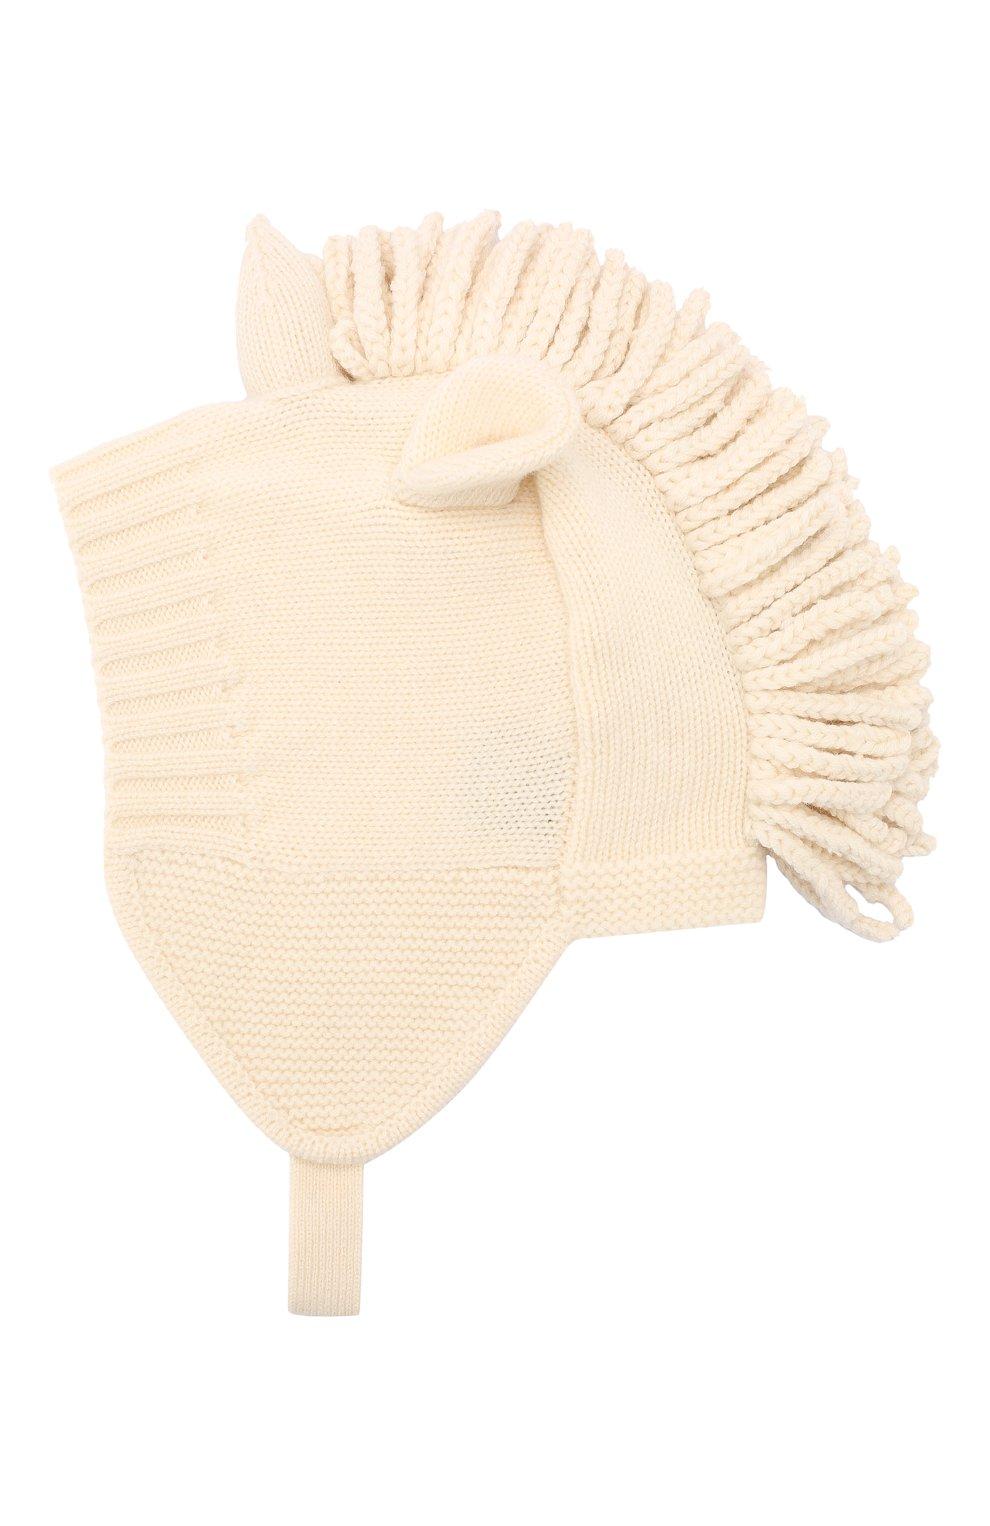 Детского шапка из шерсти и кашемира BURBERRY бежевого цвета, арт. 8016659 | Фото 2